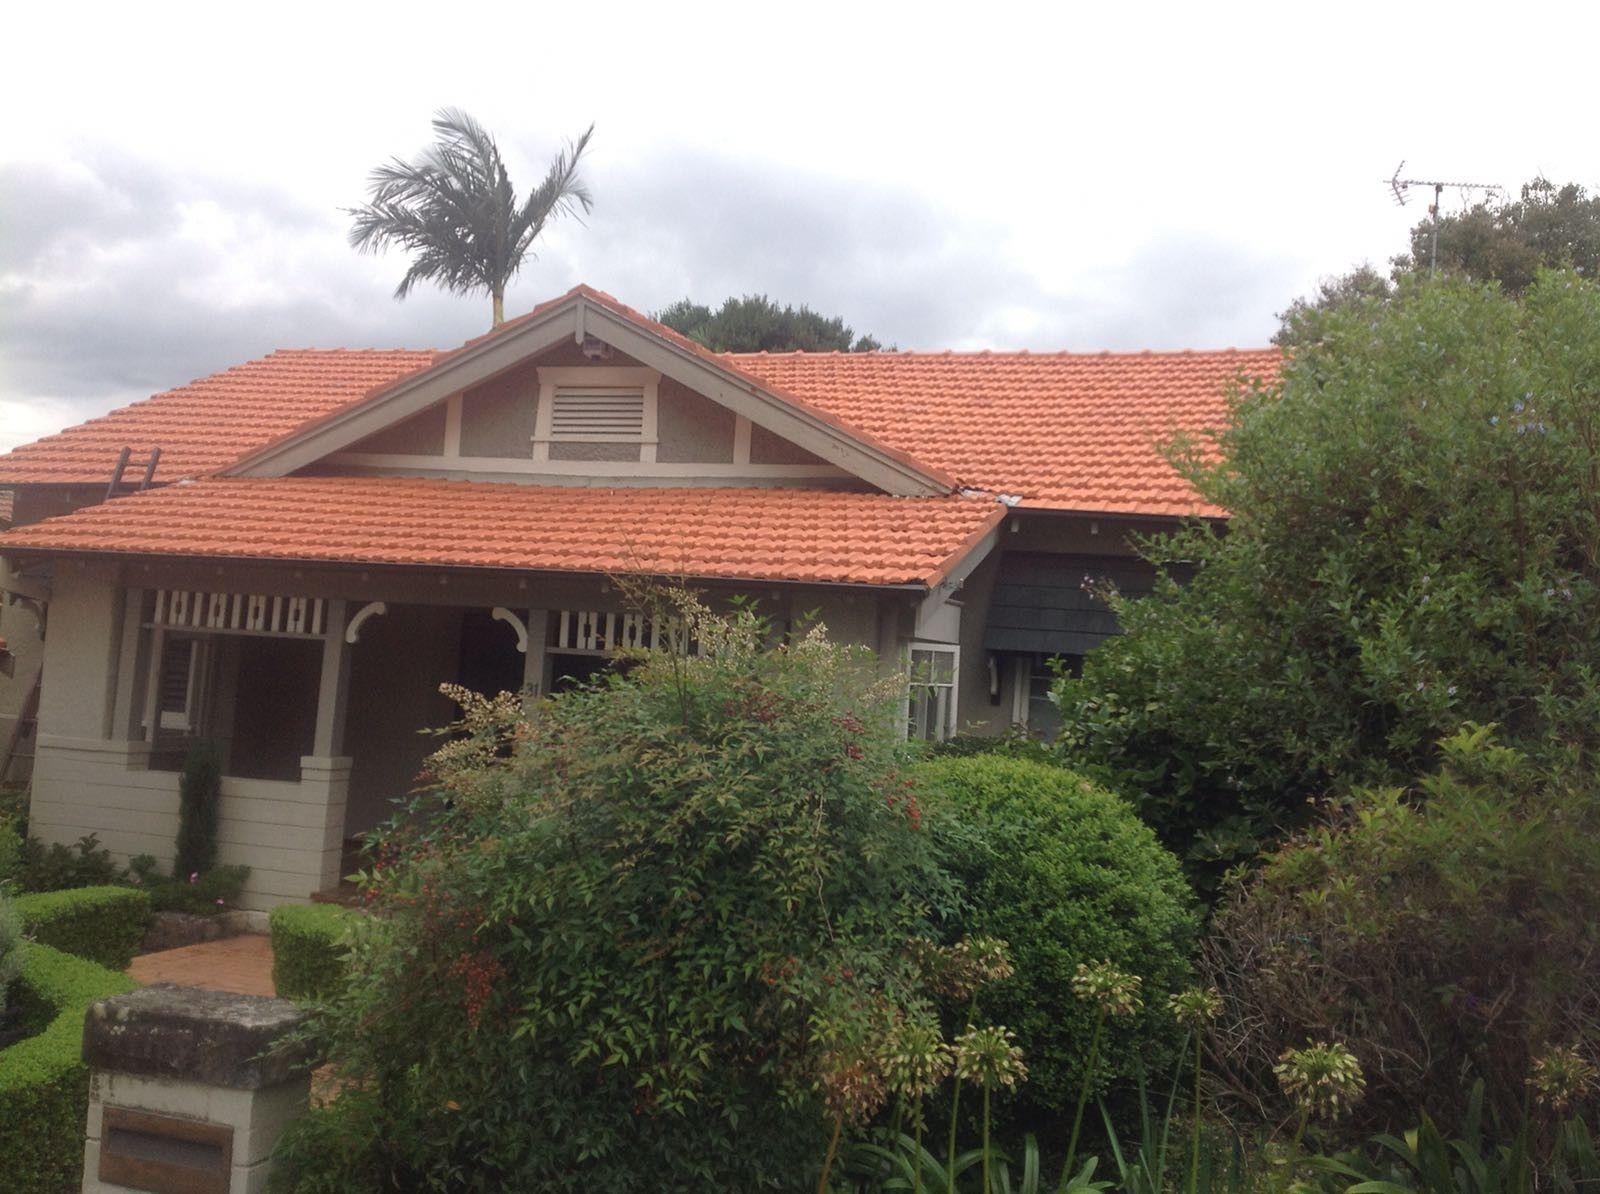 Roof Repairs Sydney Roof Repair Roof Restoration Colorbond Roof